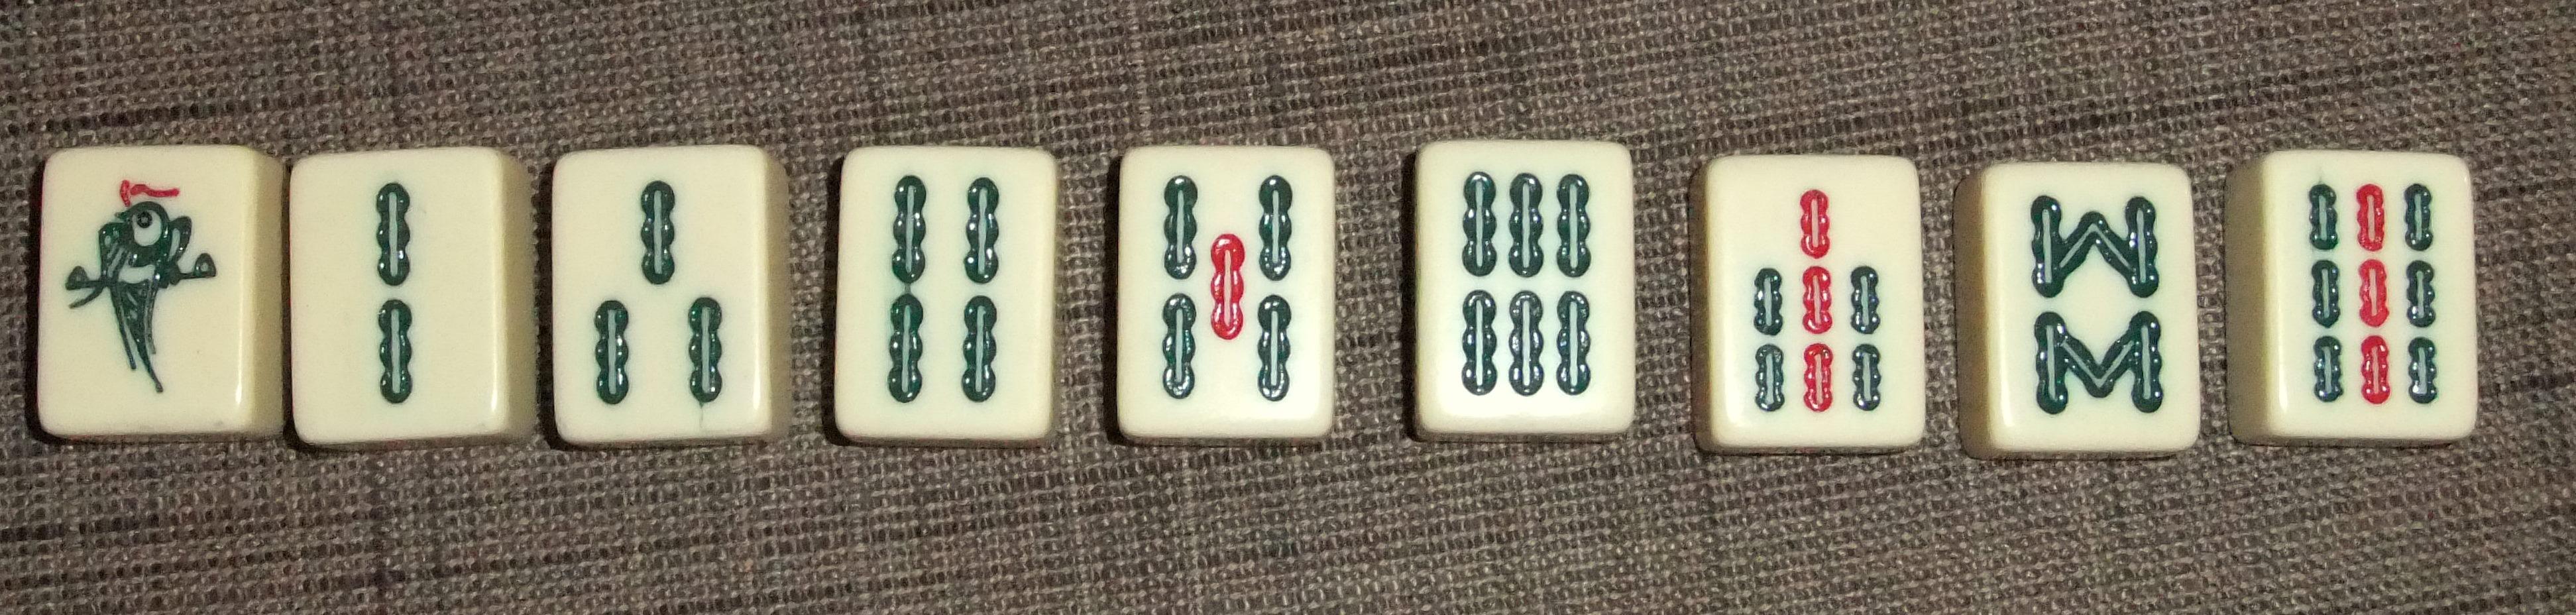 mahjong-tiles-bamboos.jpg